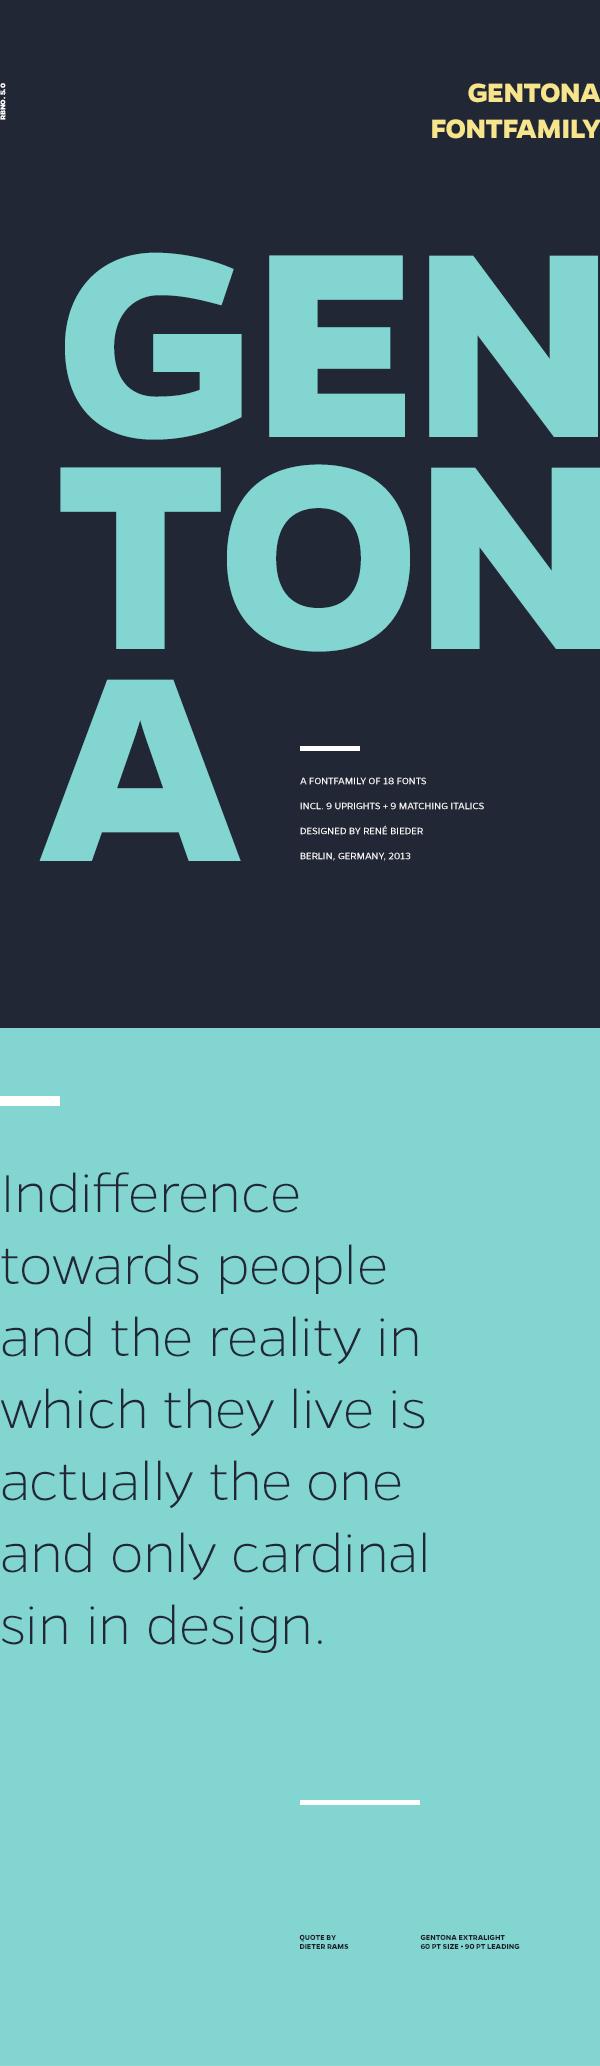 Gentona - font family by Rene Bieder